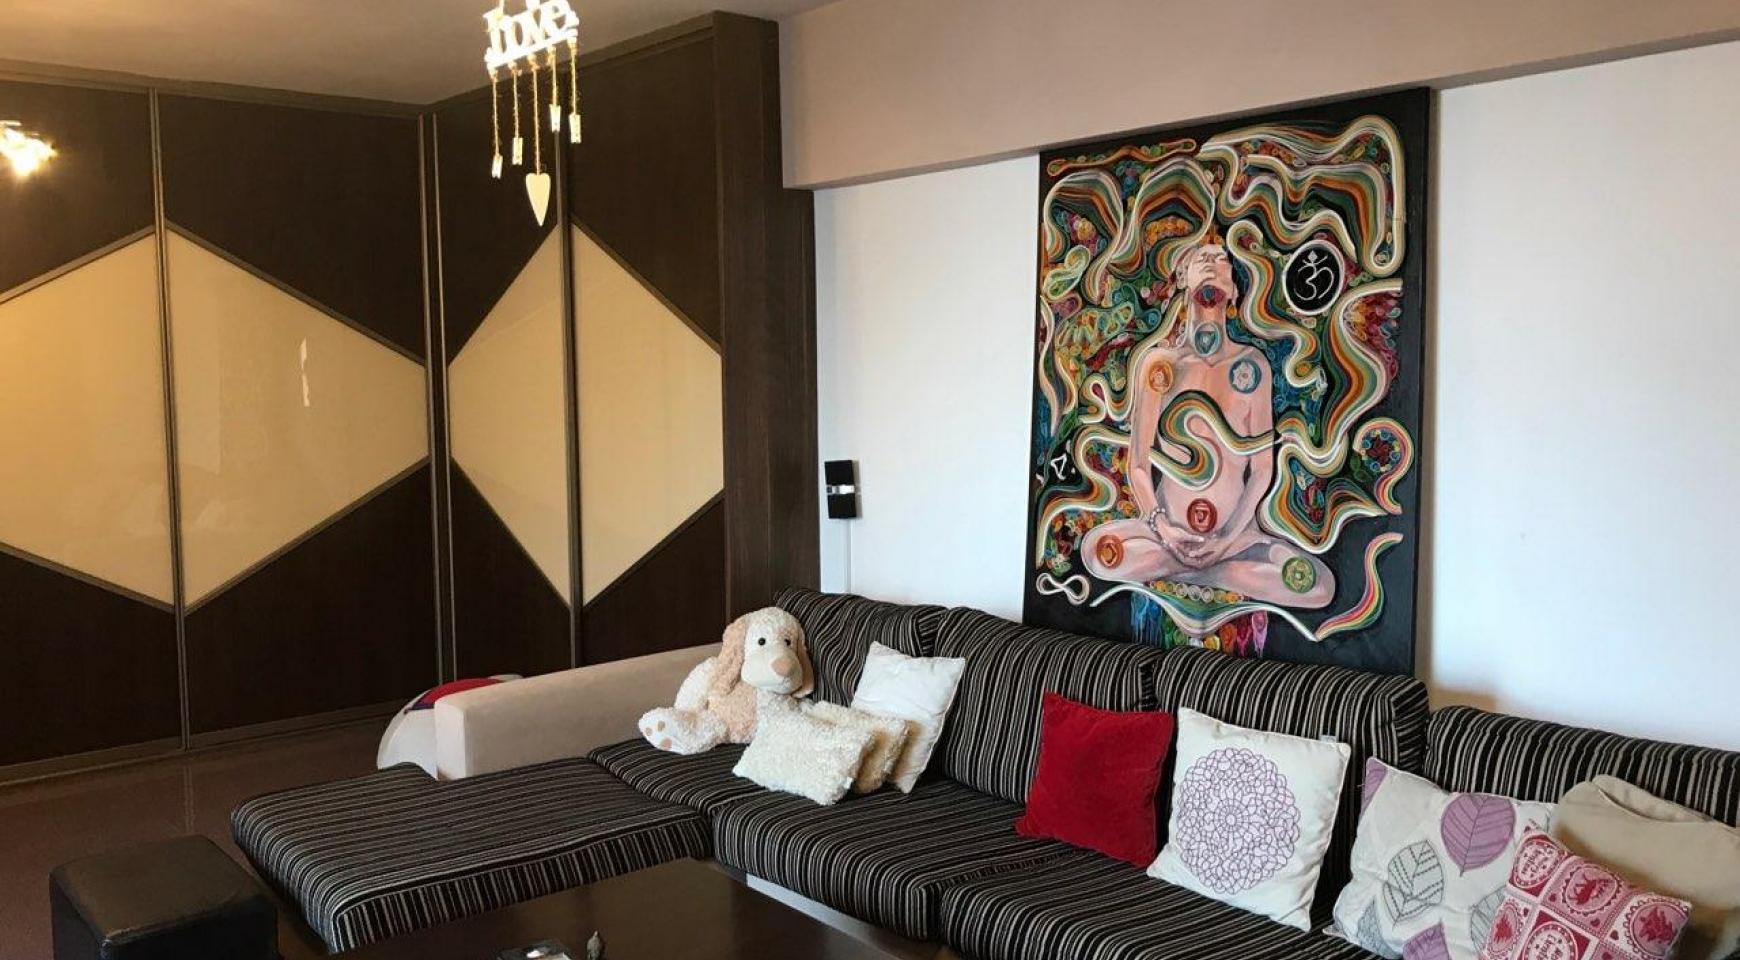 3 Bedroom Apartment in Molos Area near Limassol Marina - 1